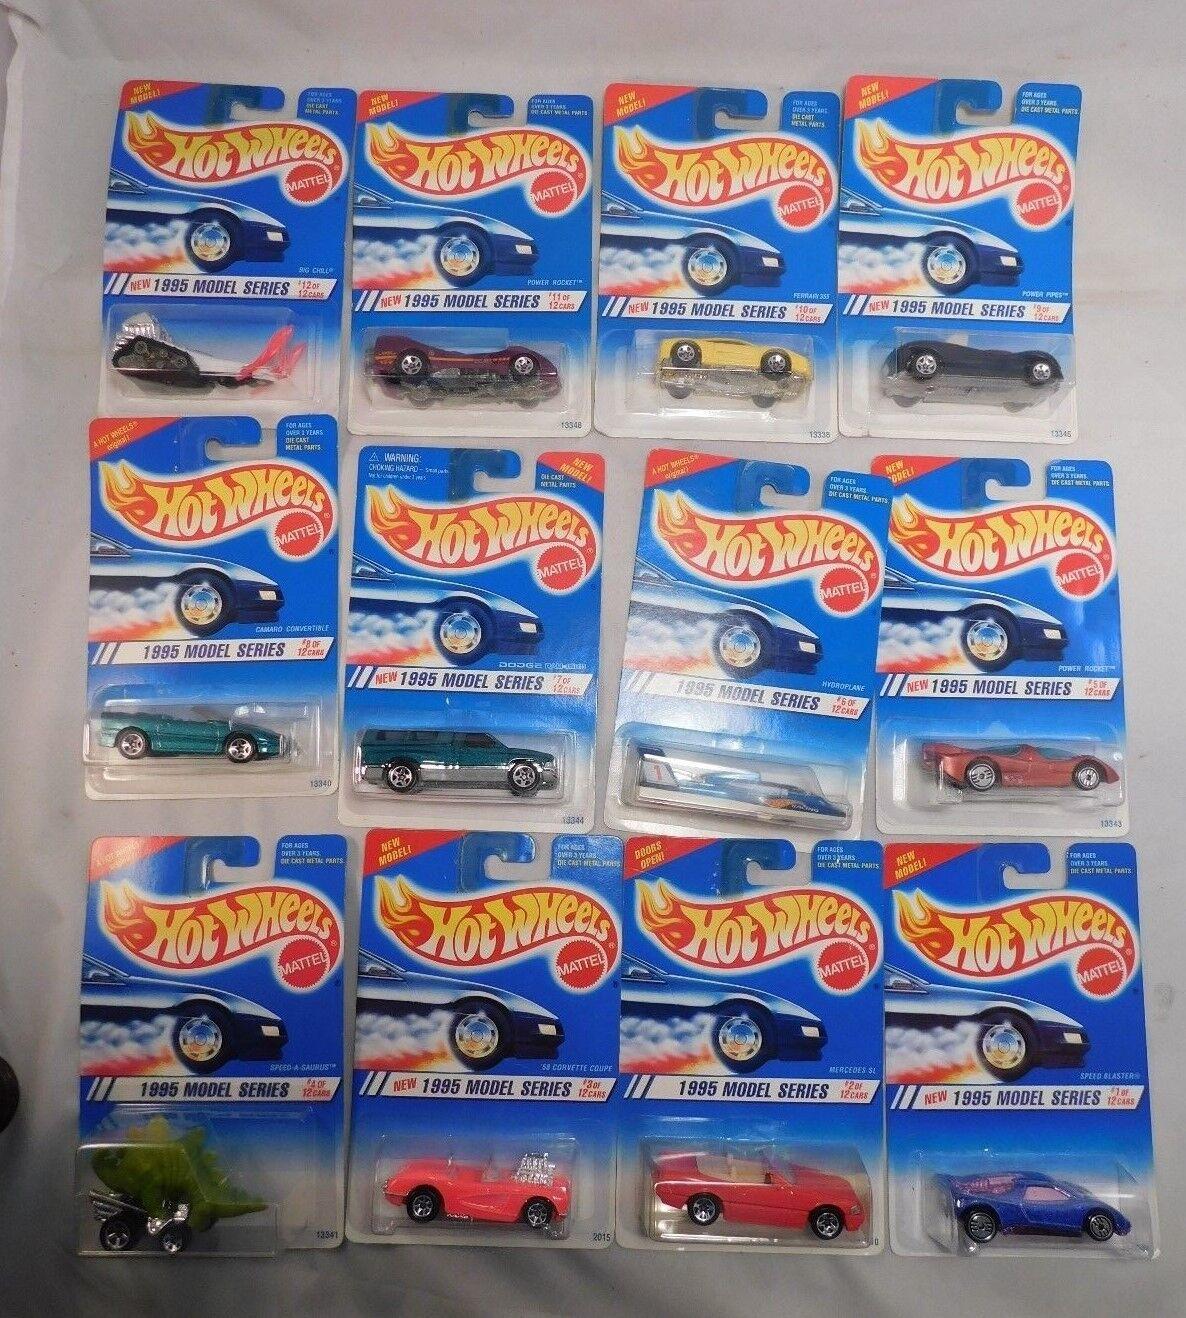 Lot of 12 , Mattel Hot Wheels 1995 Model Series  1 64 Scale Vehicles MIB